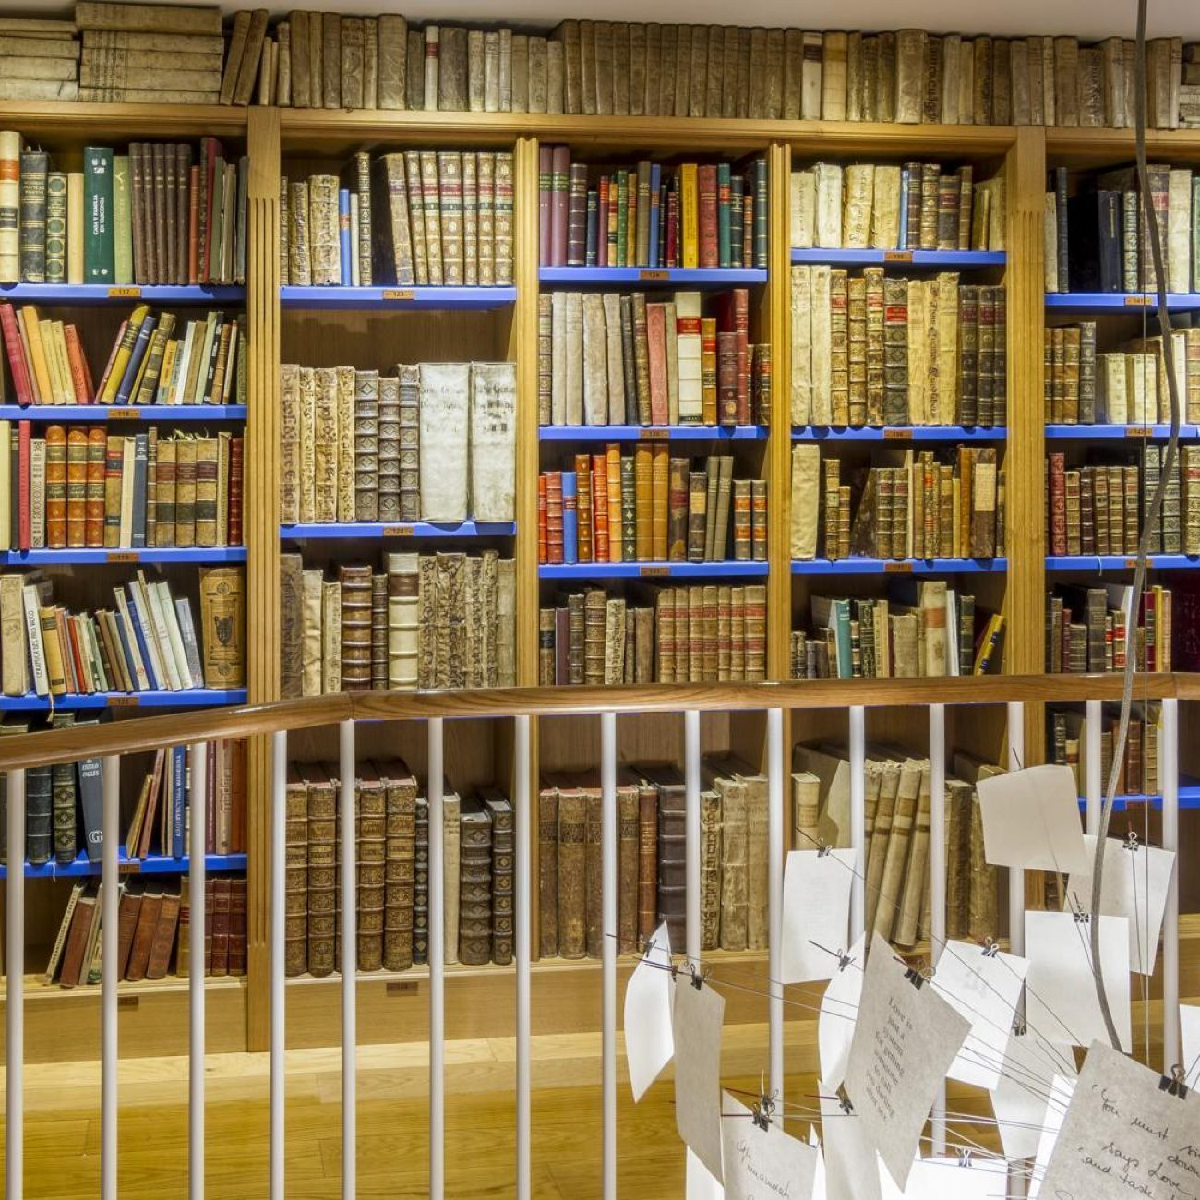 3548-libreria-anticuaria-astarloa-04